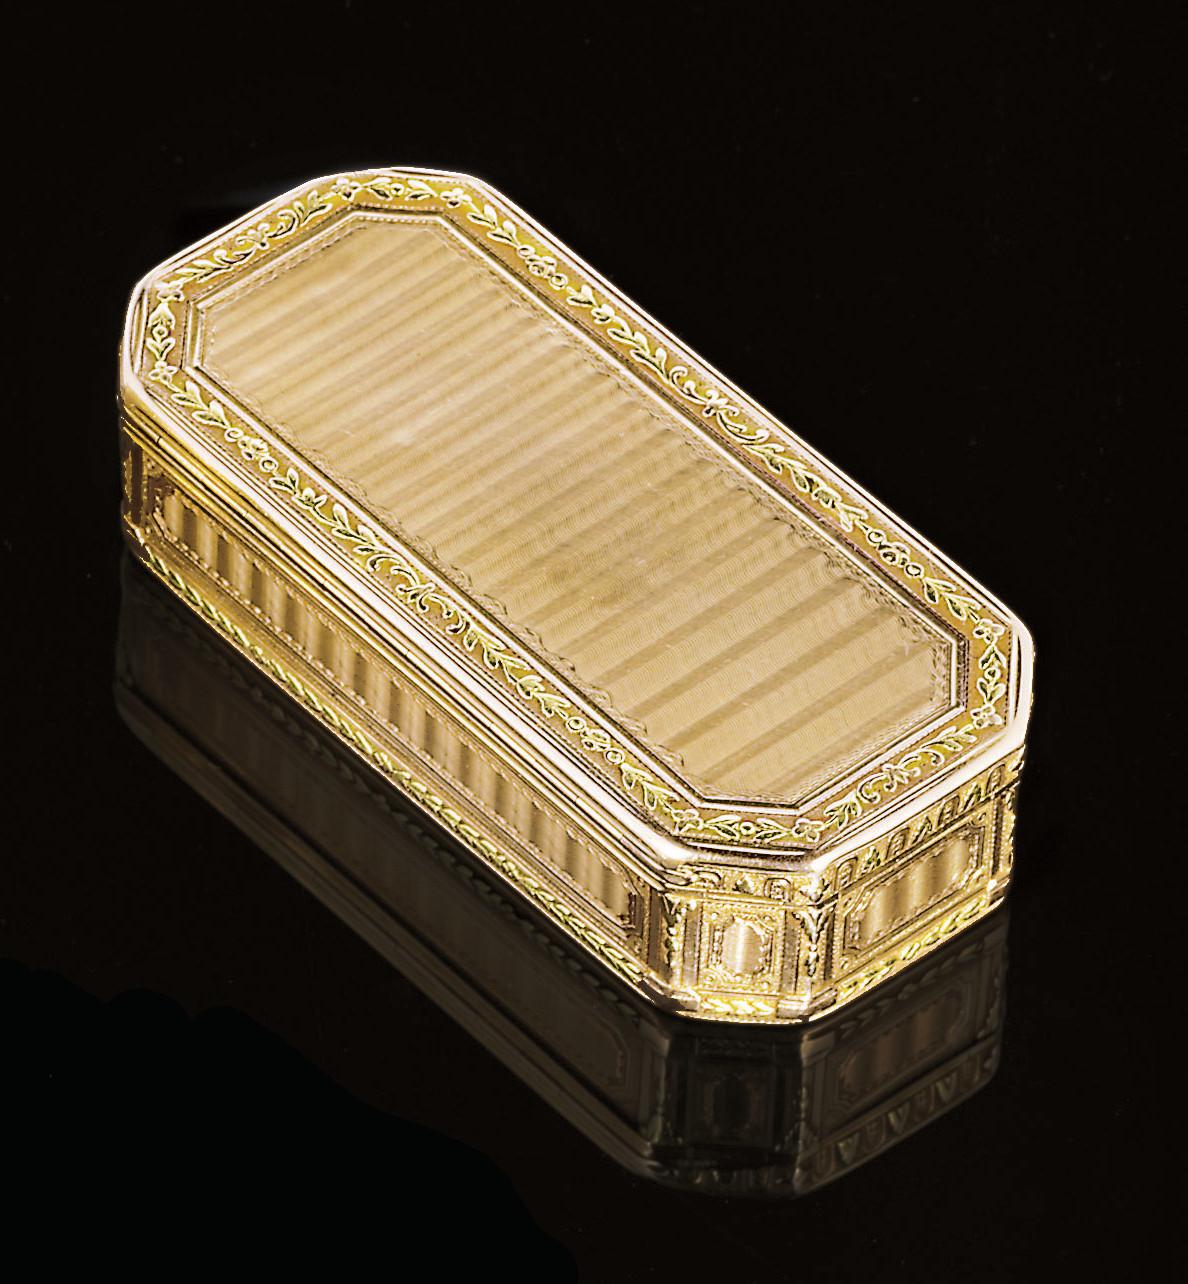 A LOUIS XVI TWO-COLOUR GOLD SNUFF-BOX